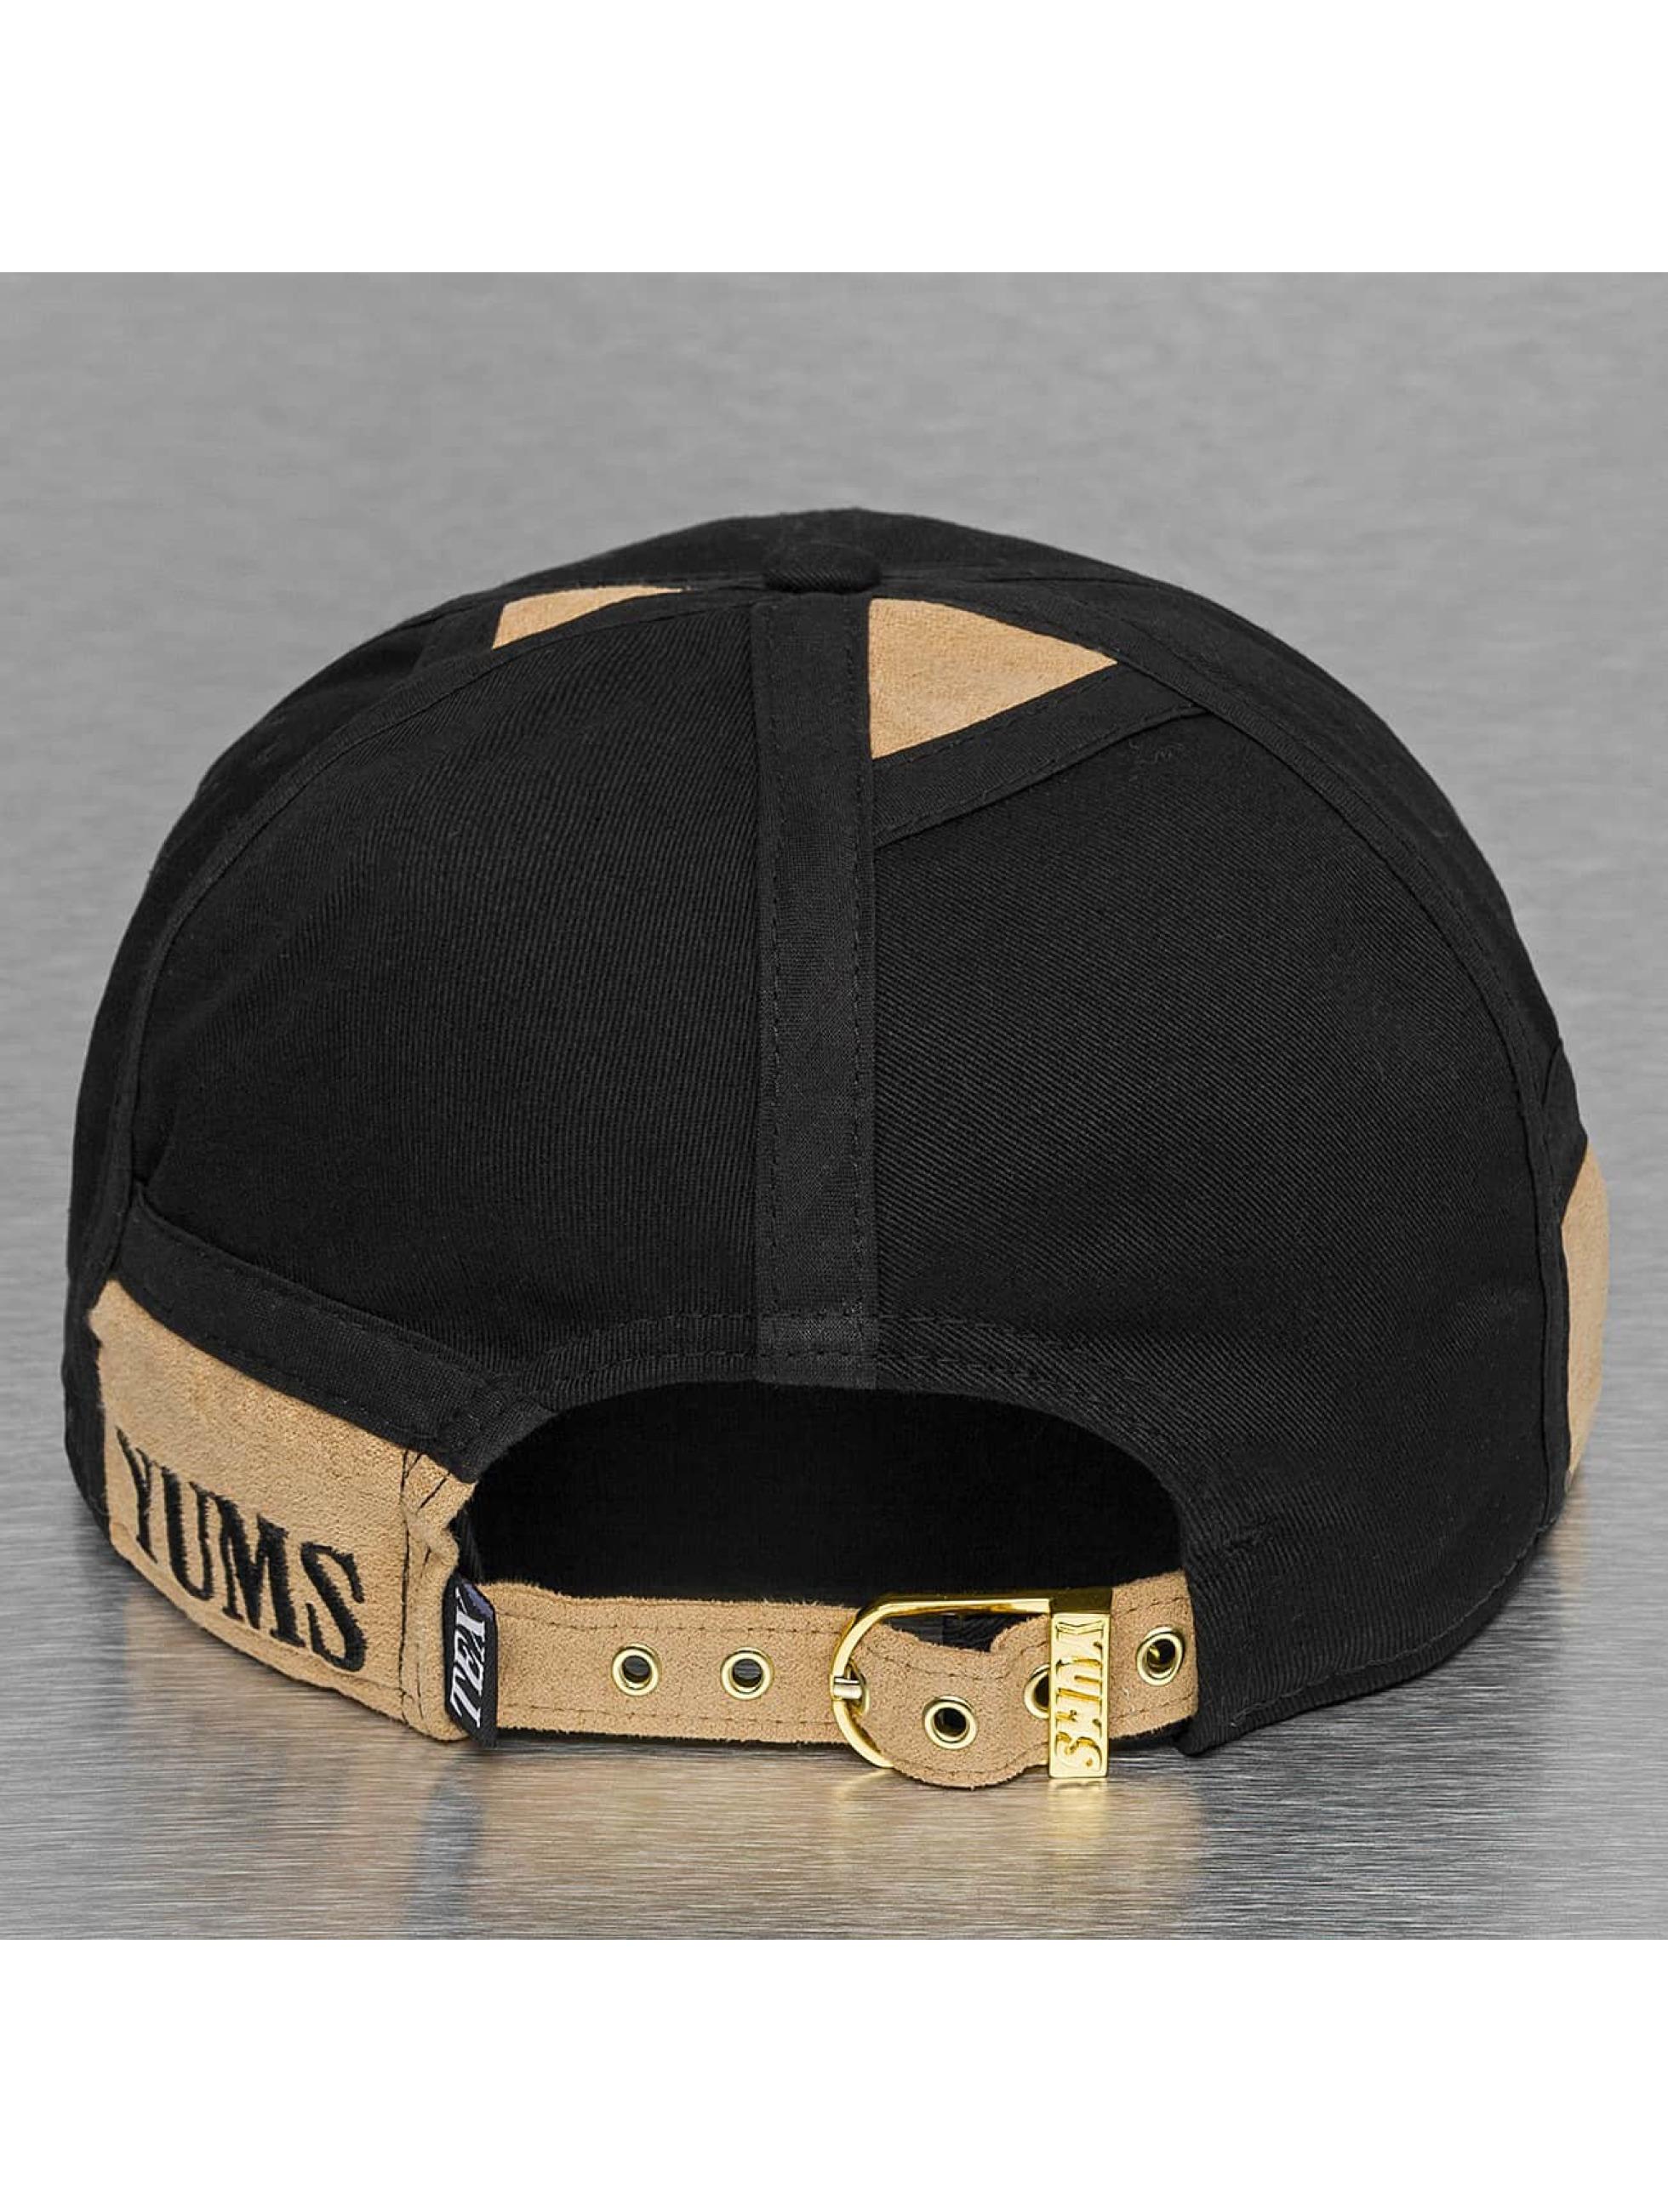 Yums snapback cap LUX Black Tag zwart